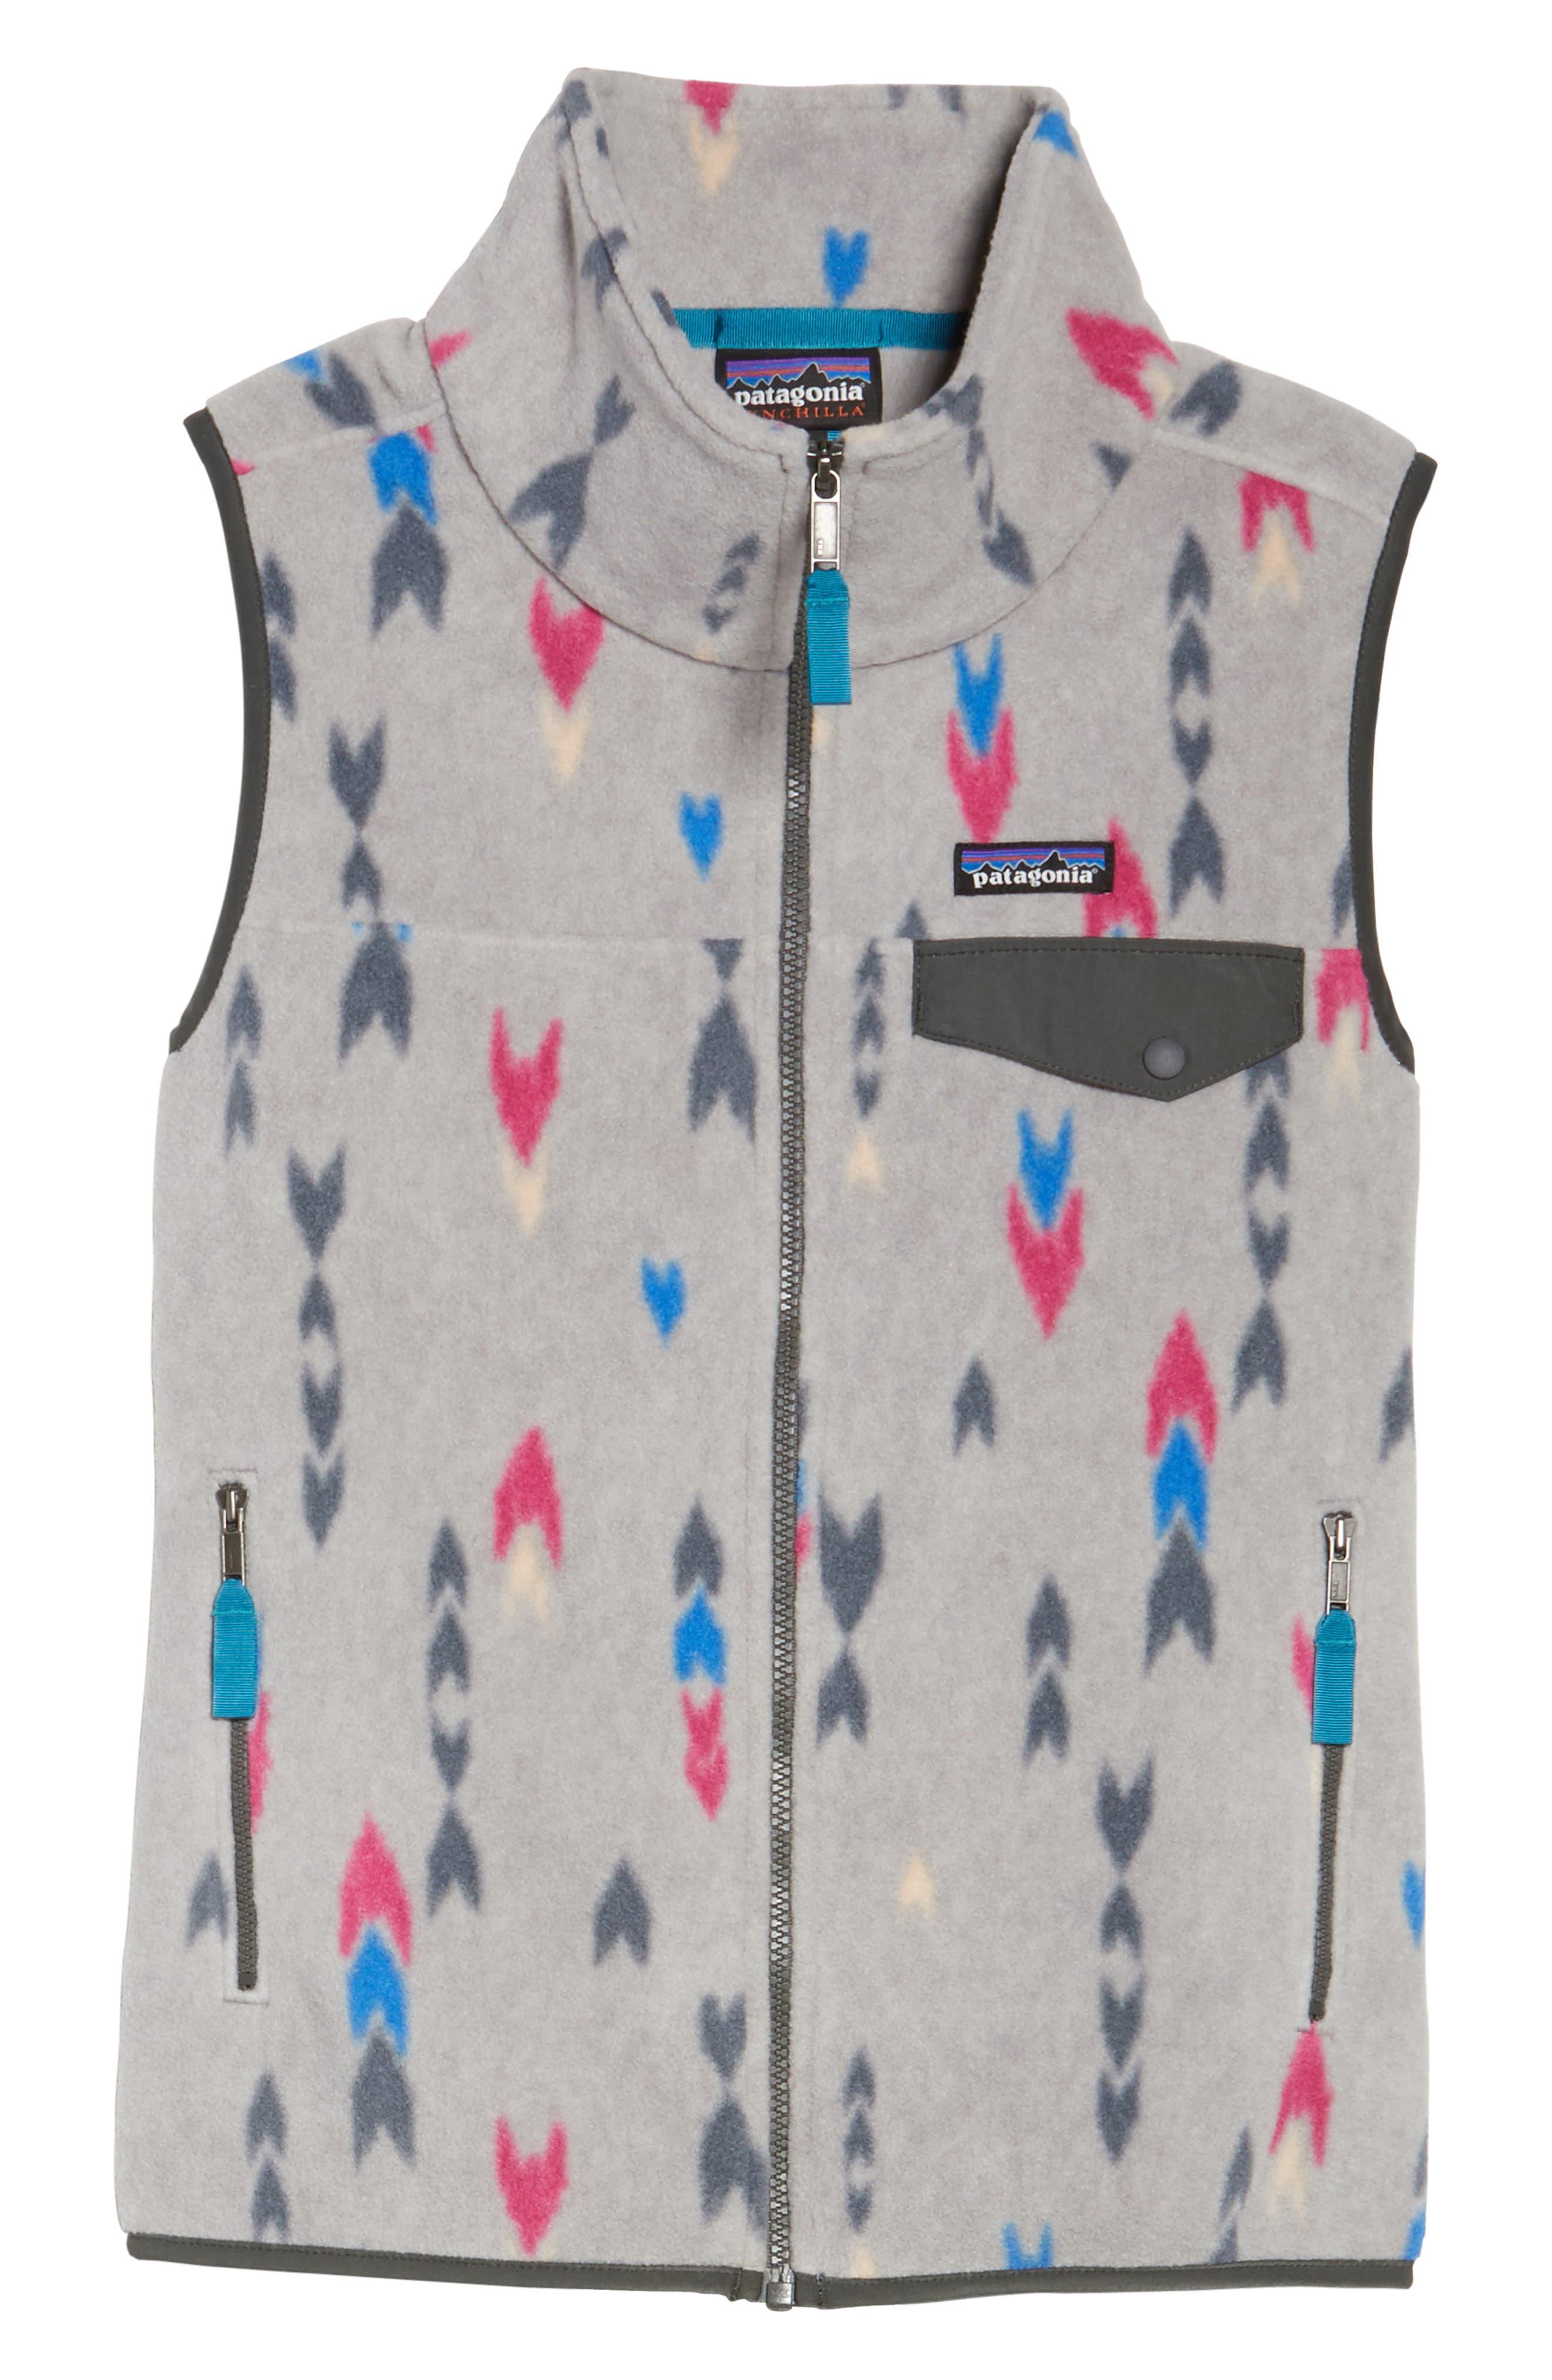 Snap-T<sup>®</sup> Fleece Vest,                             Main thumbnail 1, color,                             Wish Tails Big/ Craft Pink